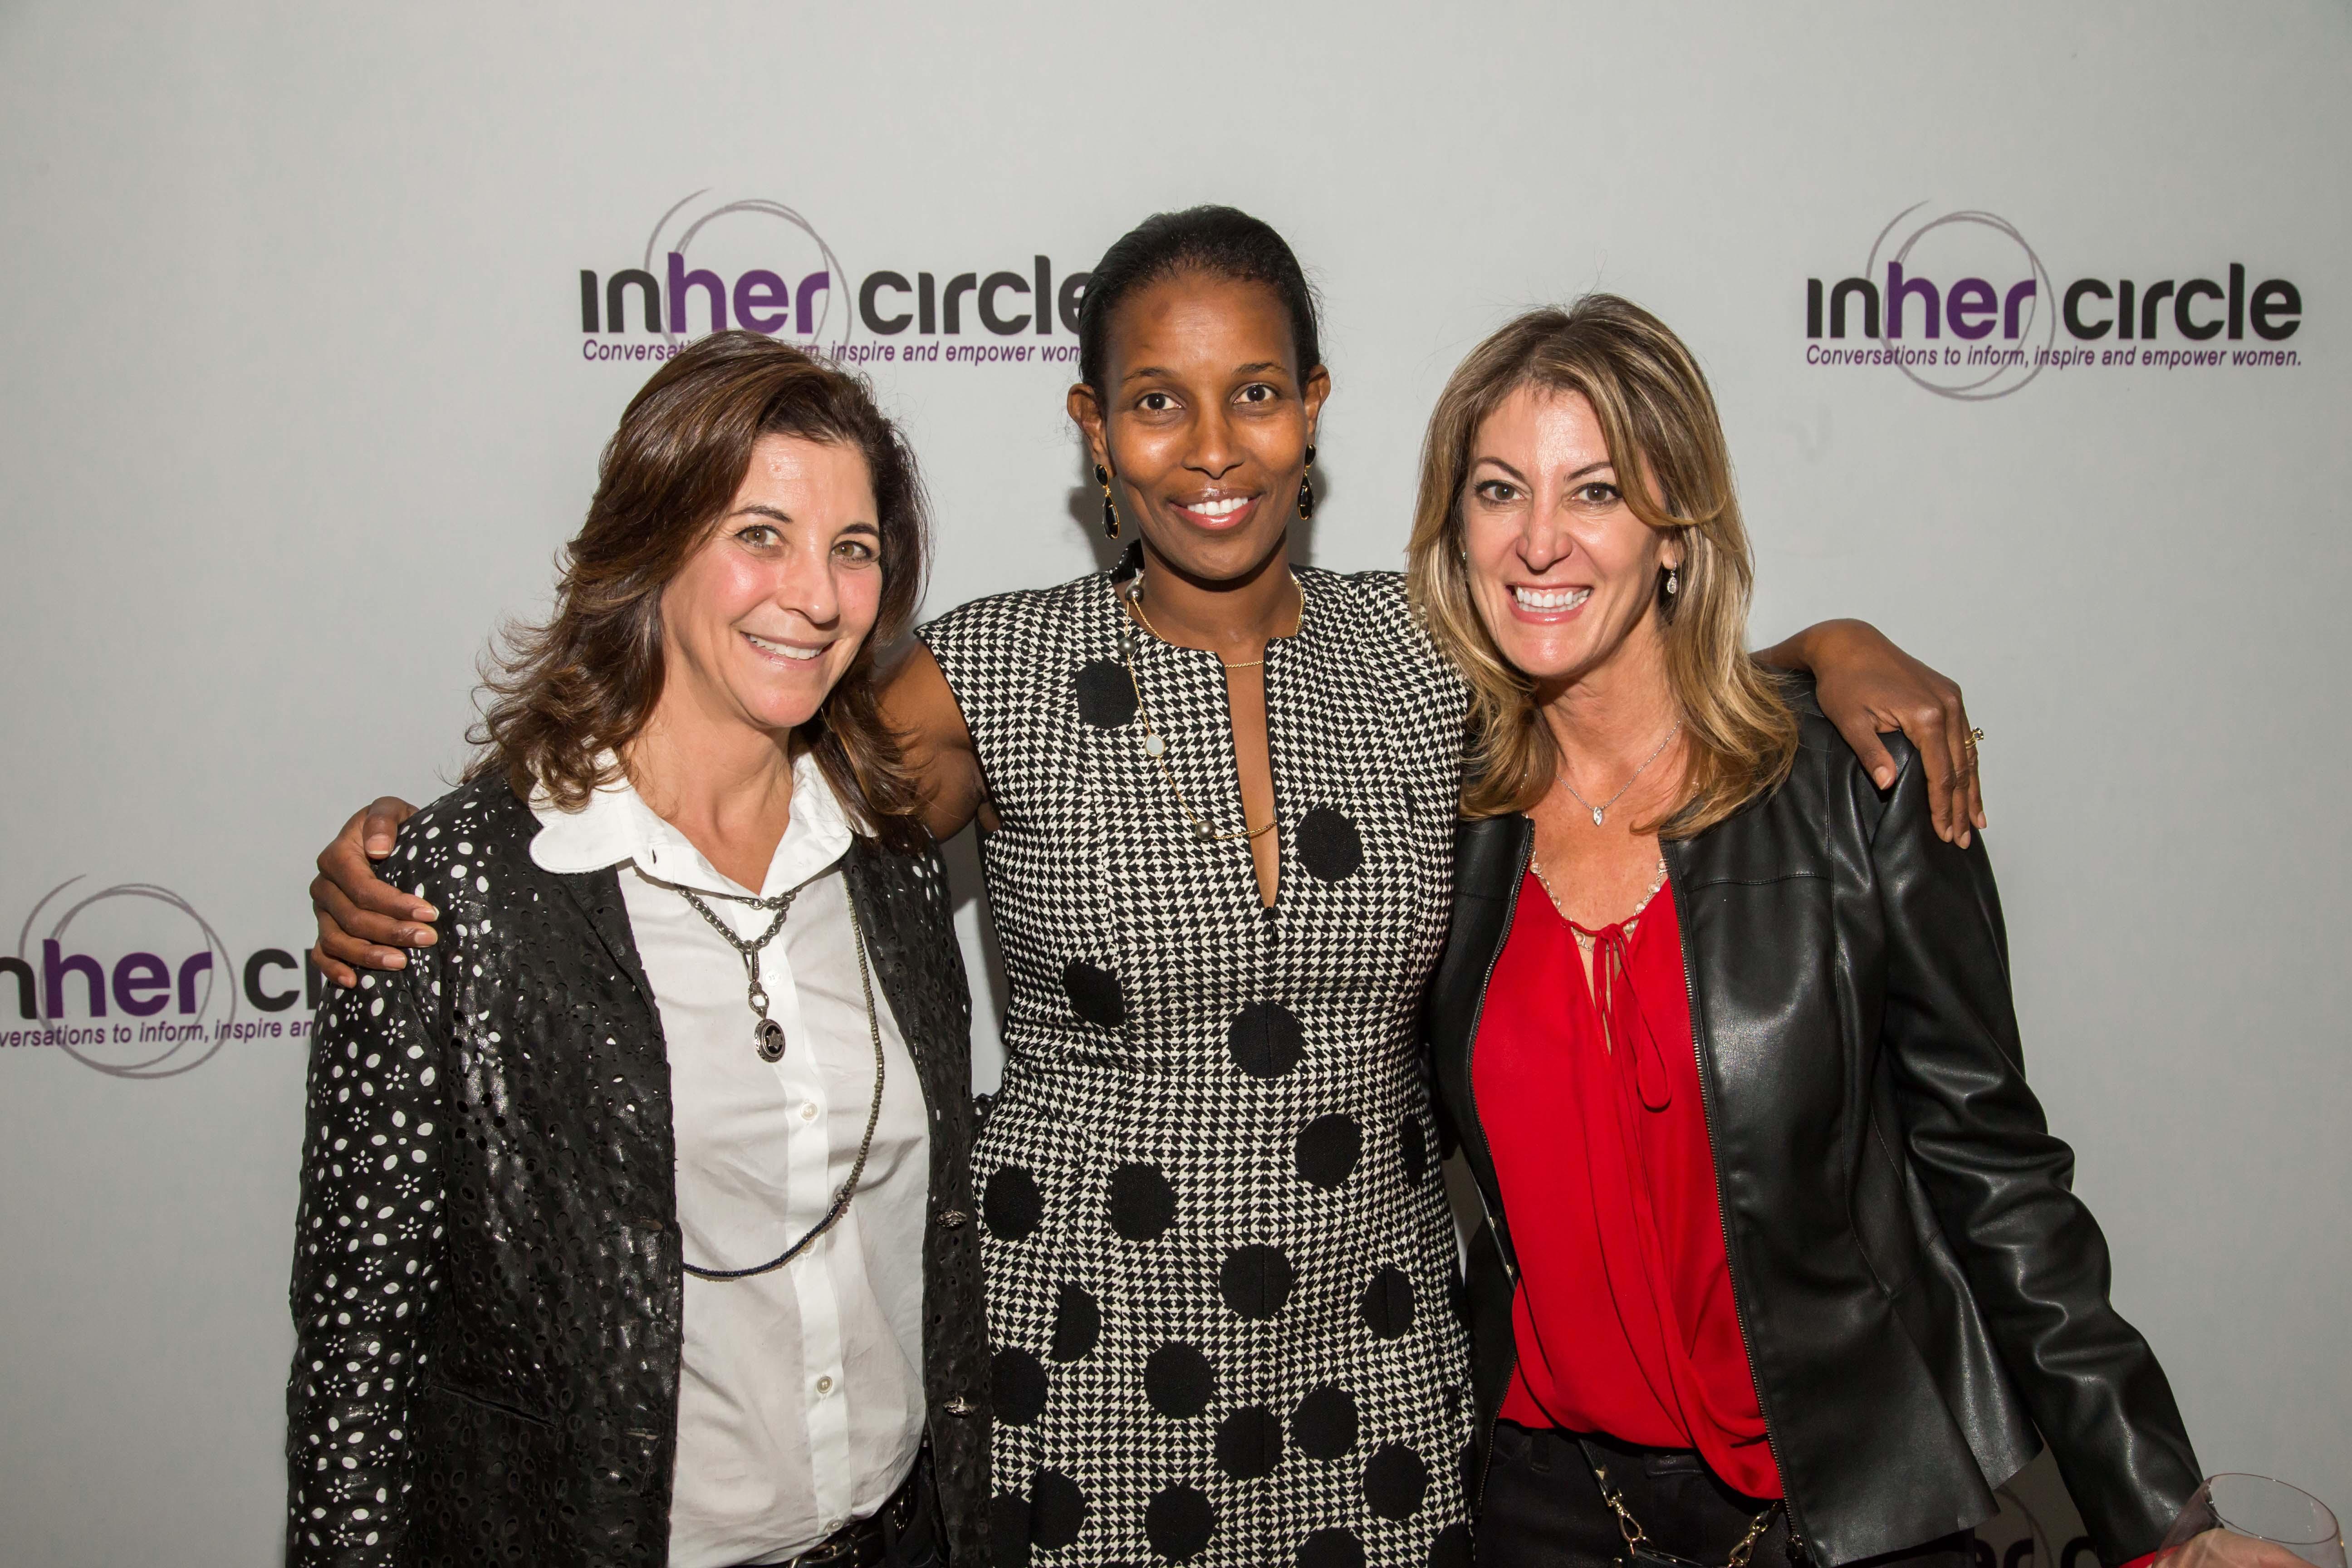 inher-circle-Beth-Friedman-Ayaan-Hirsi-Ali-salon20